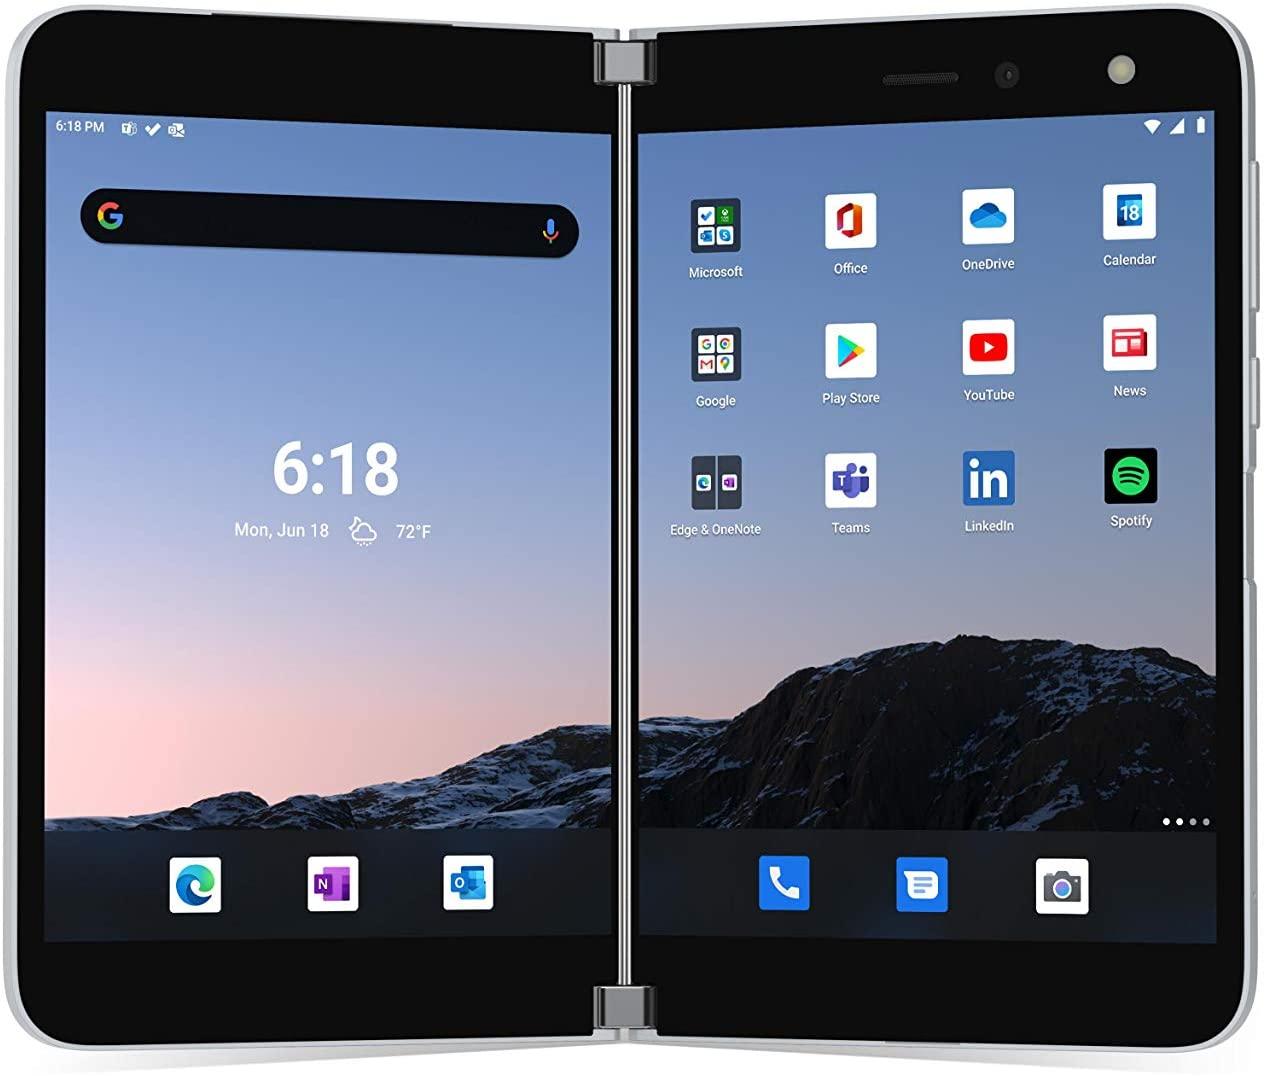 "Smartphone 5.6"" Microsoft Surface Duo 4G+ - 6 Go RAM, 128 Go SSD, Glacier (Frais d'importation inclus)"